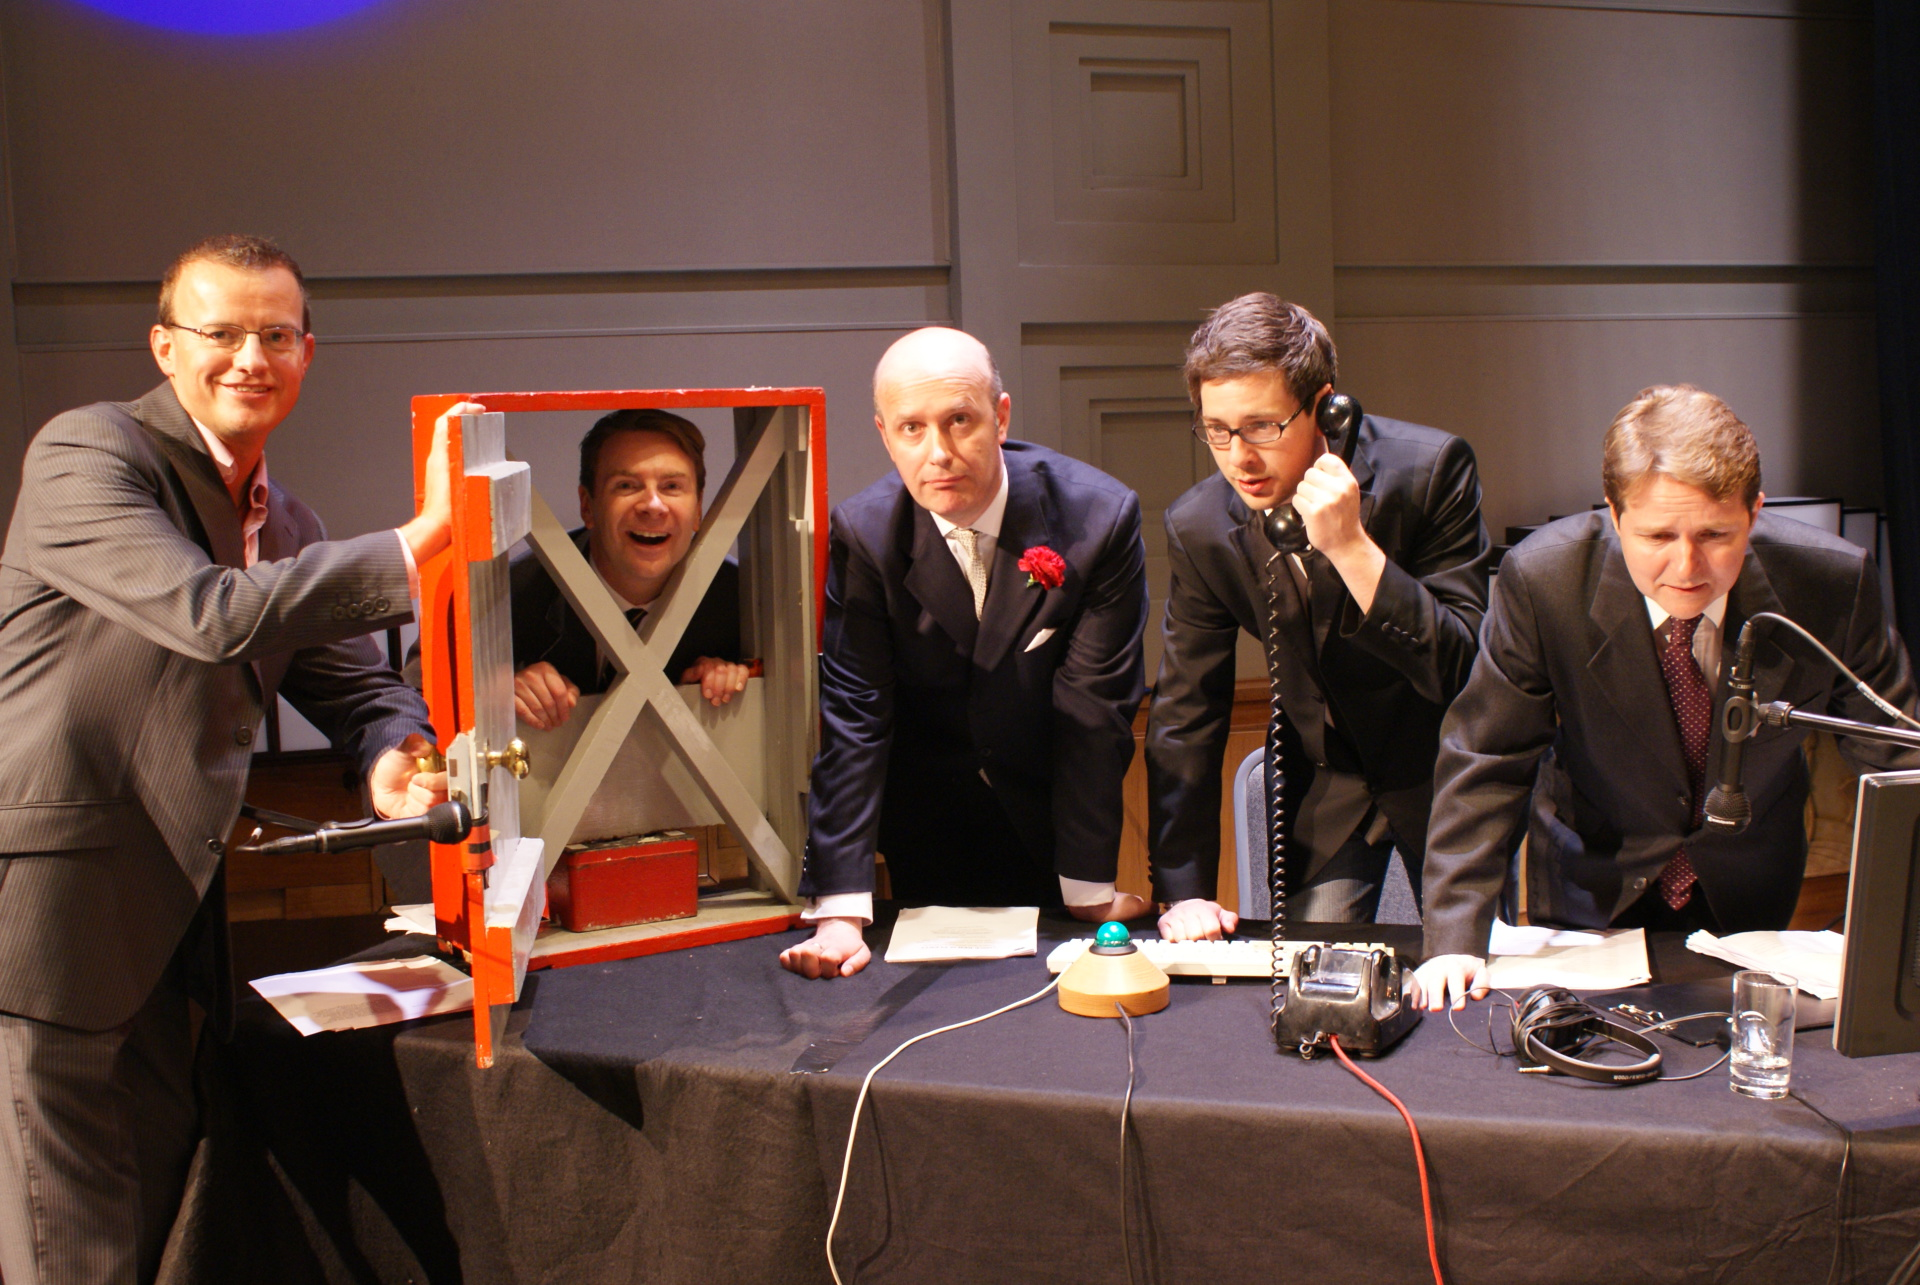 The making of Twice Ken is Plenty for BBC Radio 4